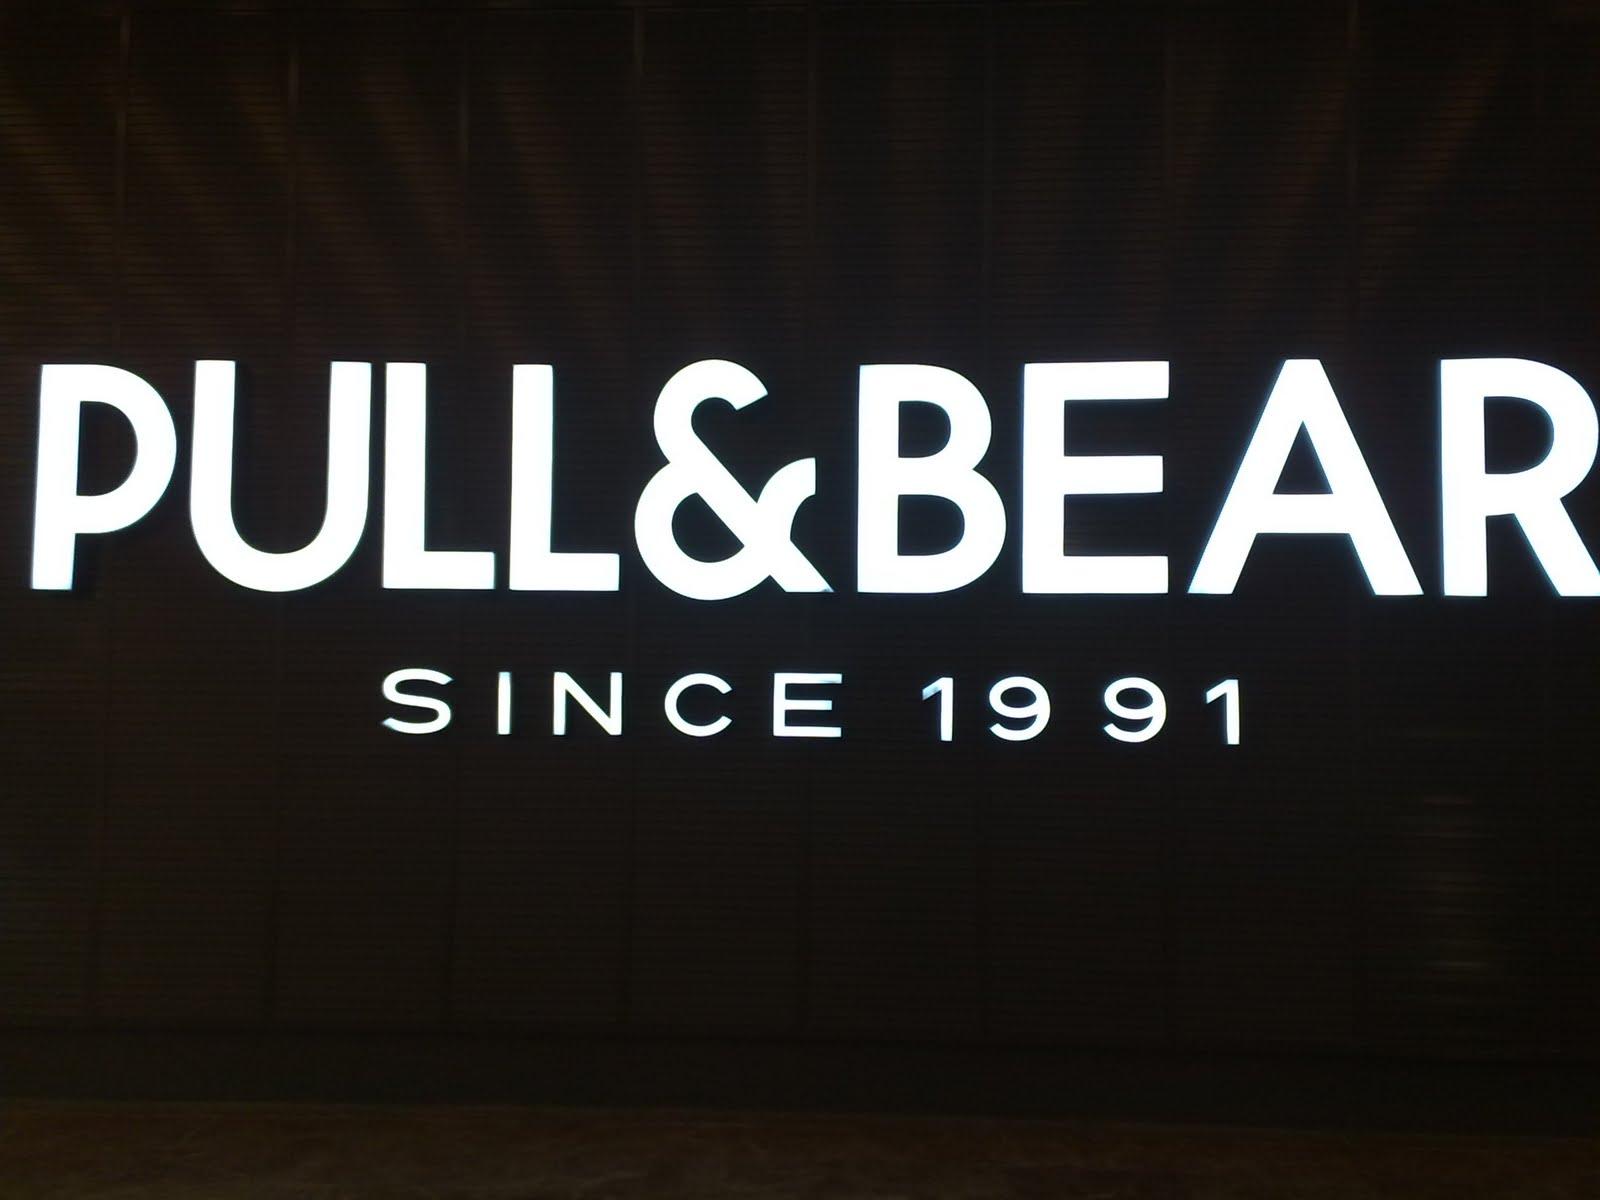 логотип бренда Pull and Bear